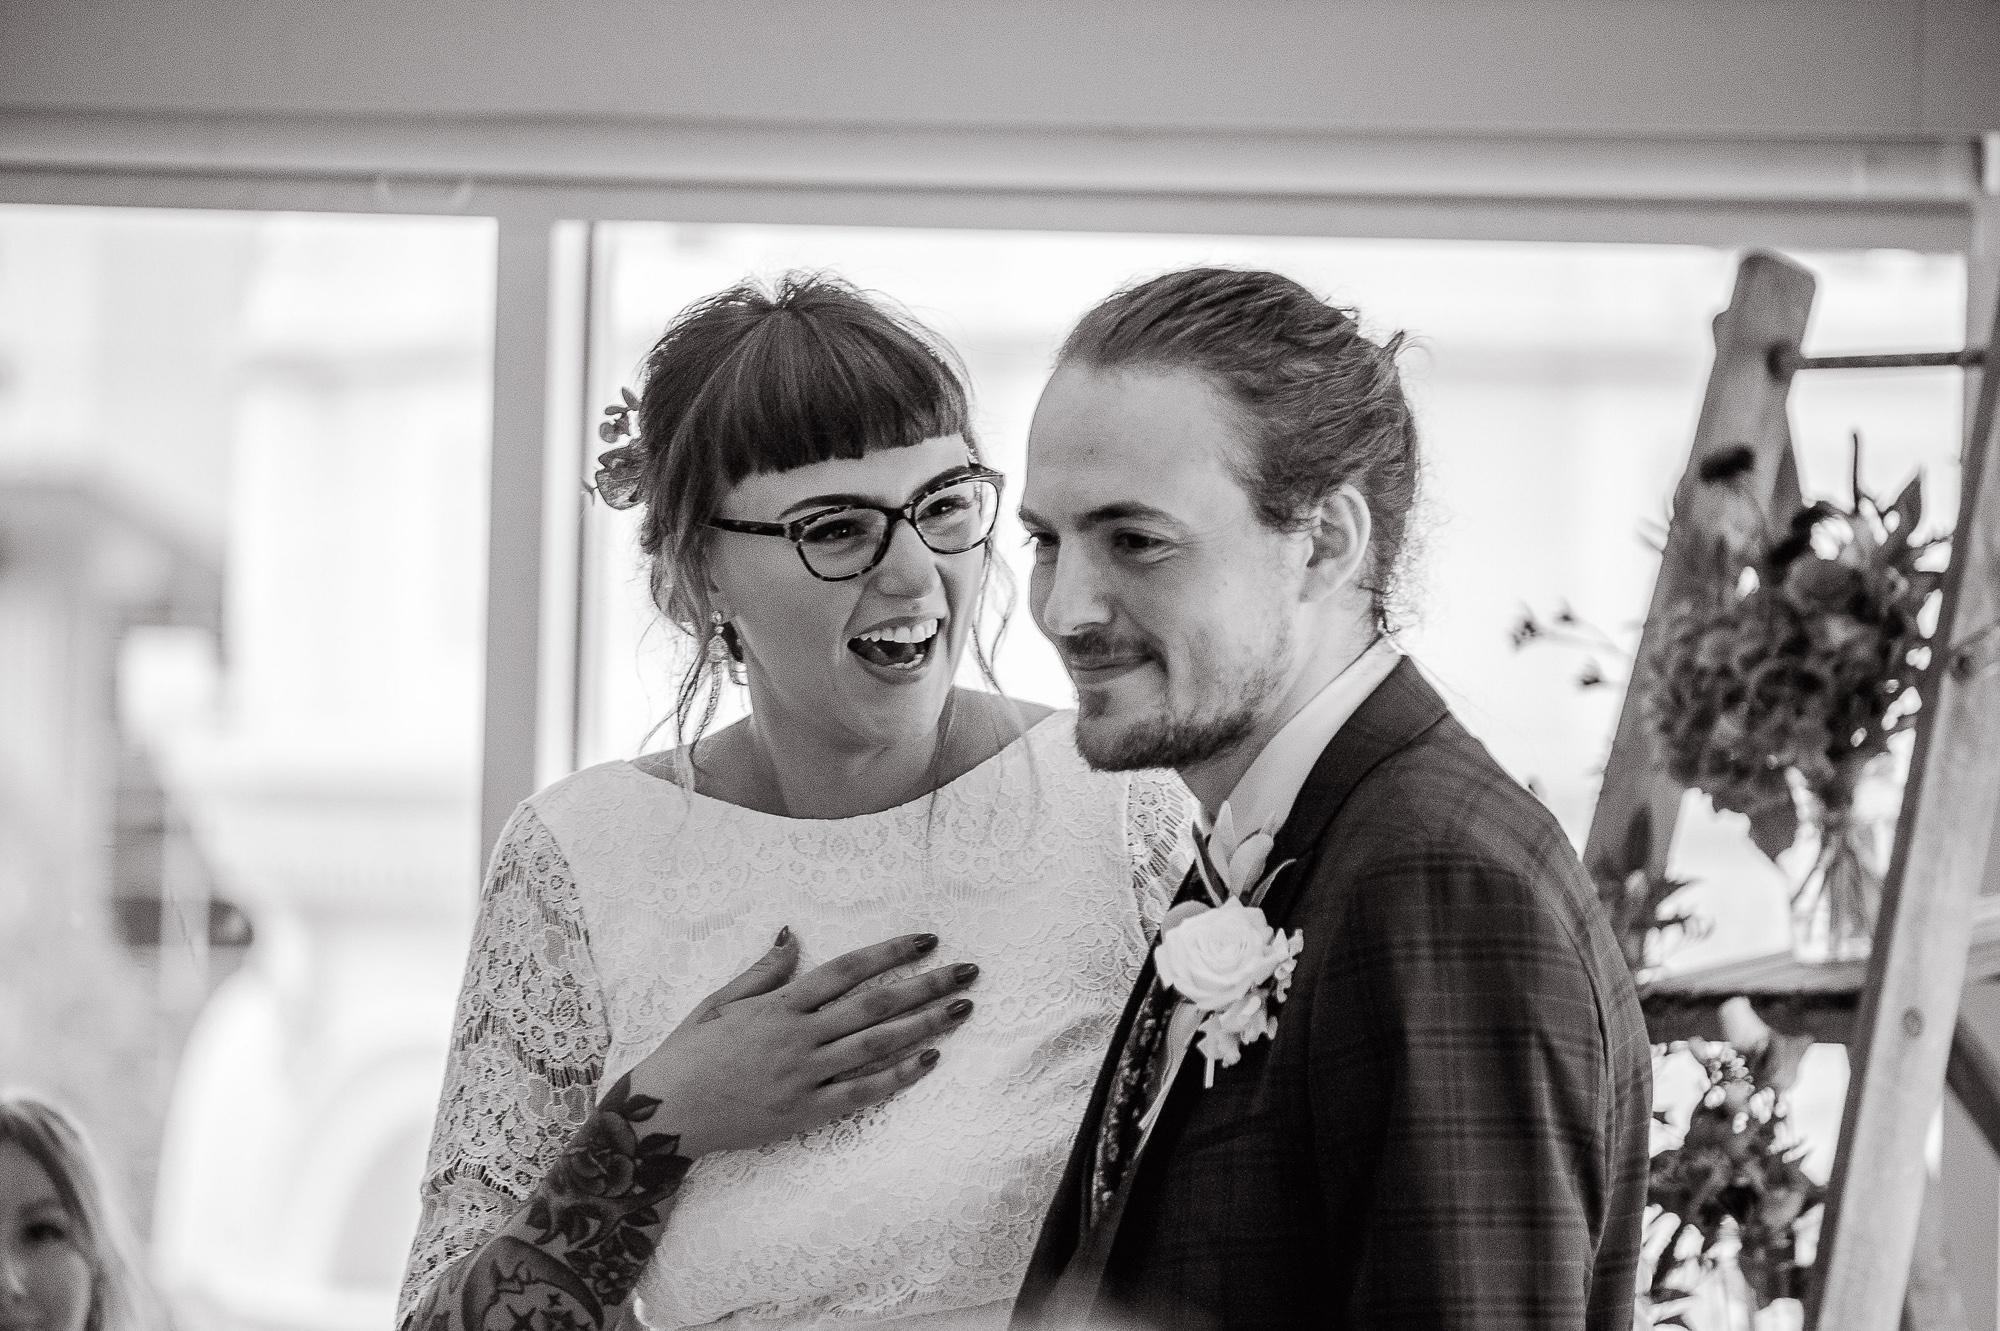 Harriet-Dahlia-Bespoke-Lace-Silk-Bohemian-Wedding-Dress-Sleeves-Tattooed-Bride-Alternative-Wedding-Sheffield-13.jpg